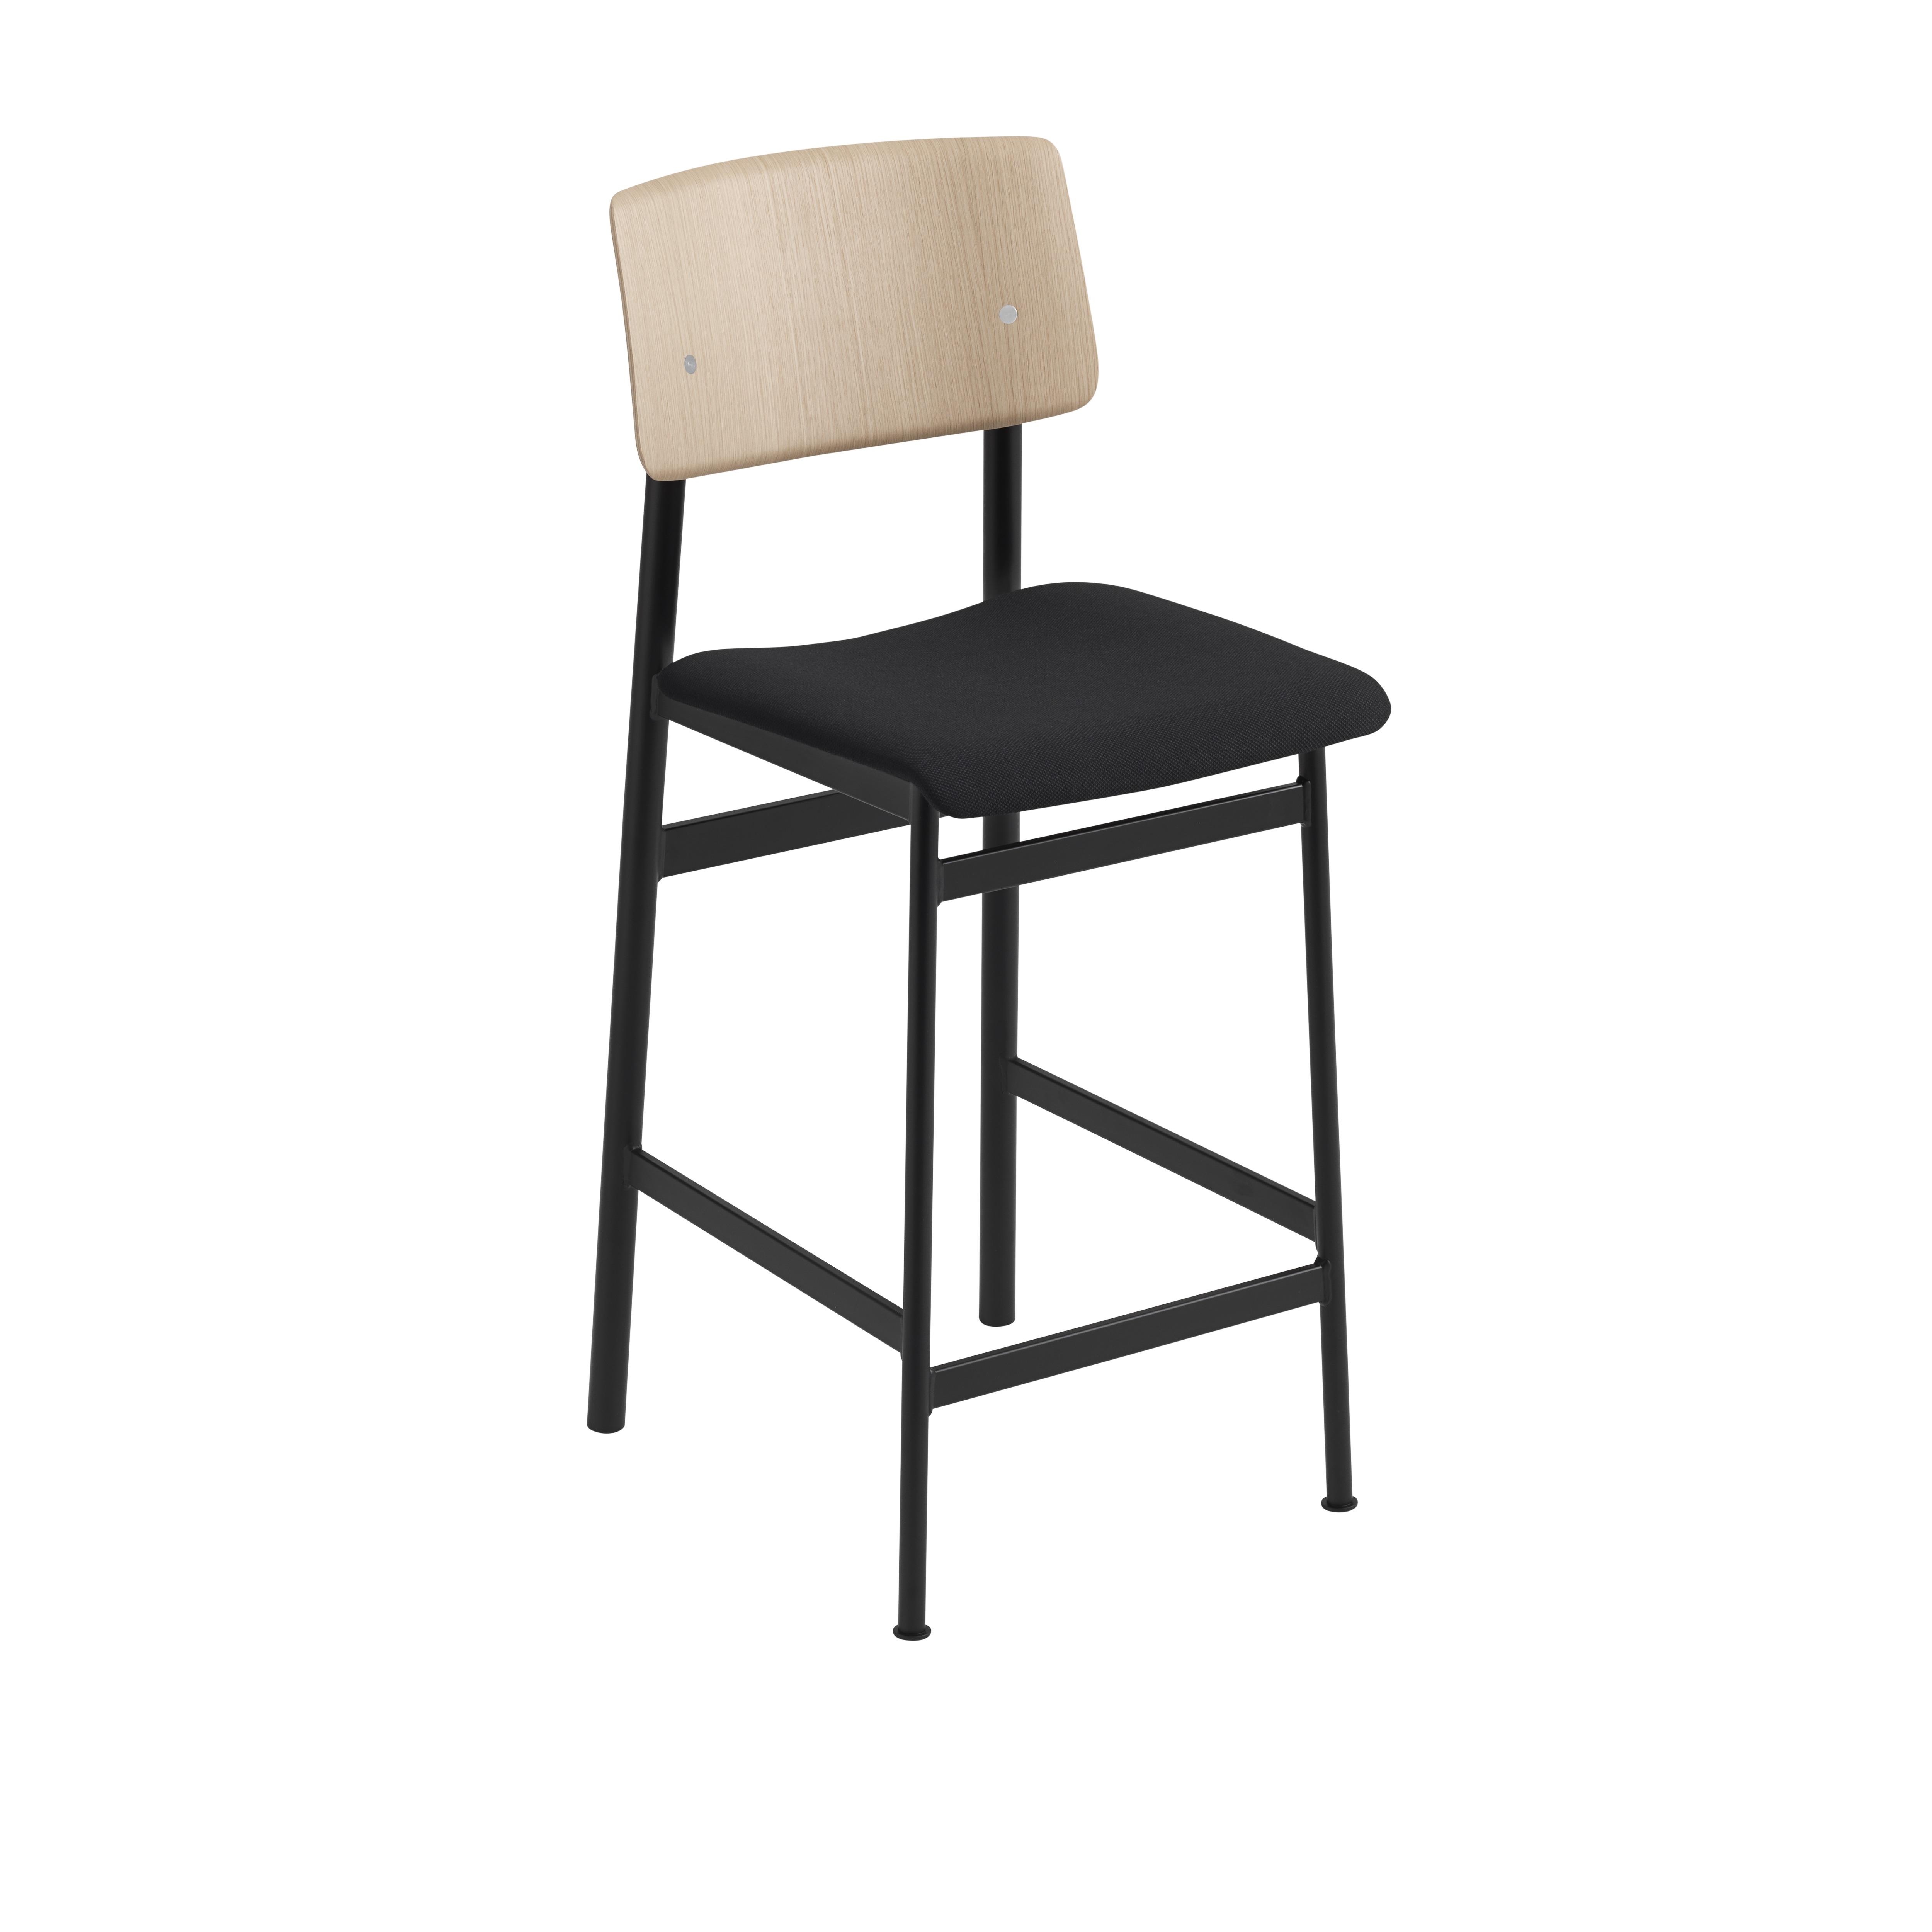 Muuto Thomas de chaise design Bentzen – Loft – bar n8myNwOv0